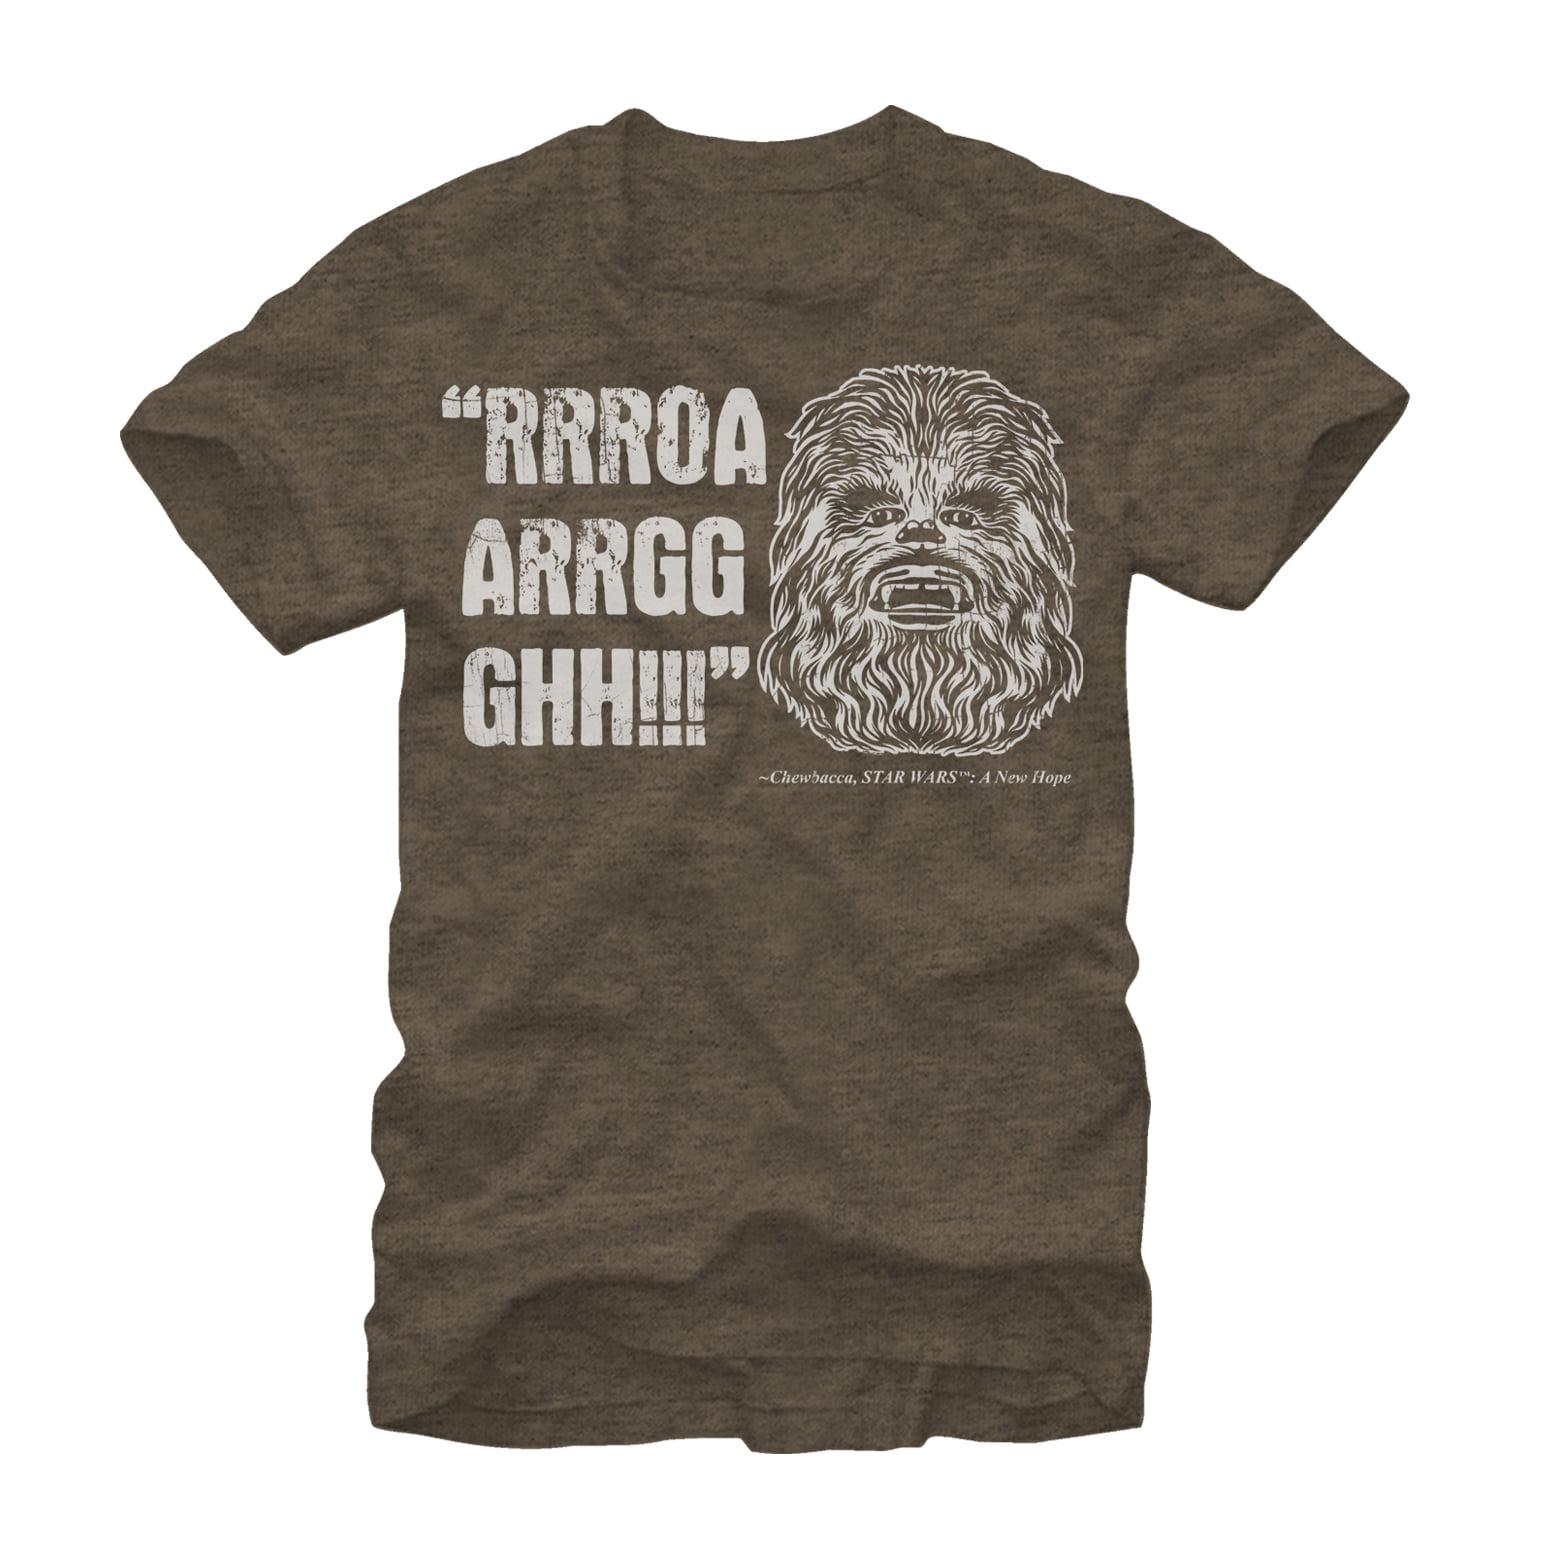 Star Wars Men's Chewbacca Quote T-Shirt